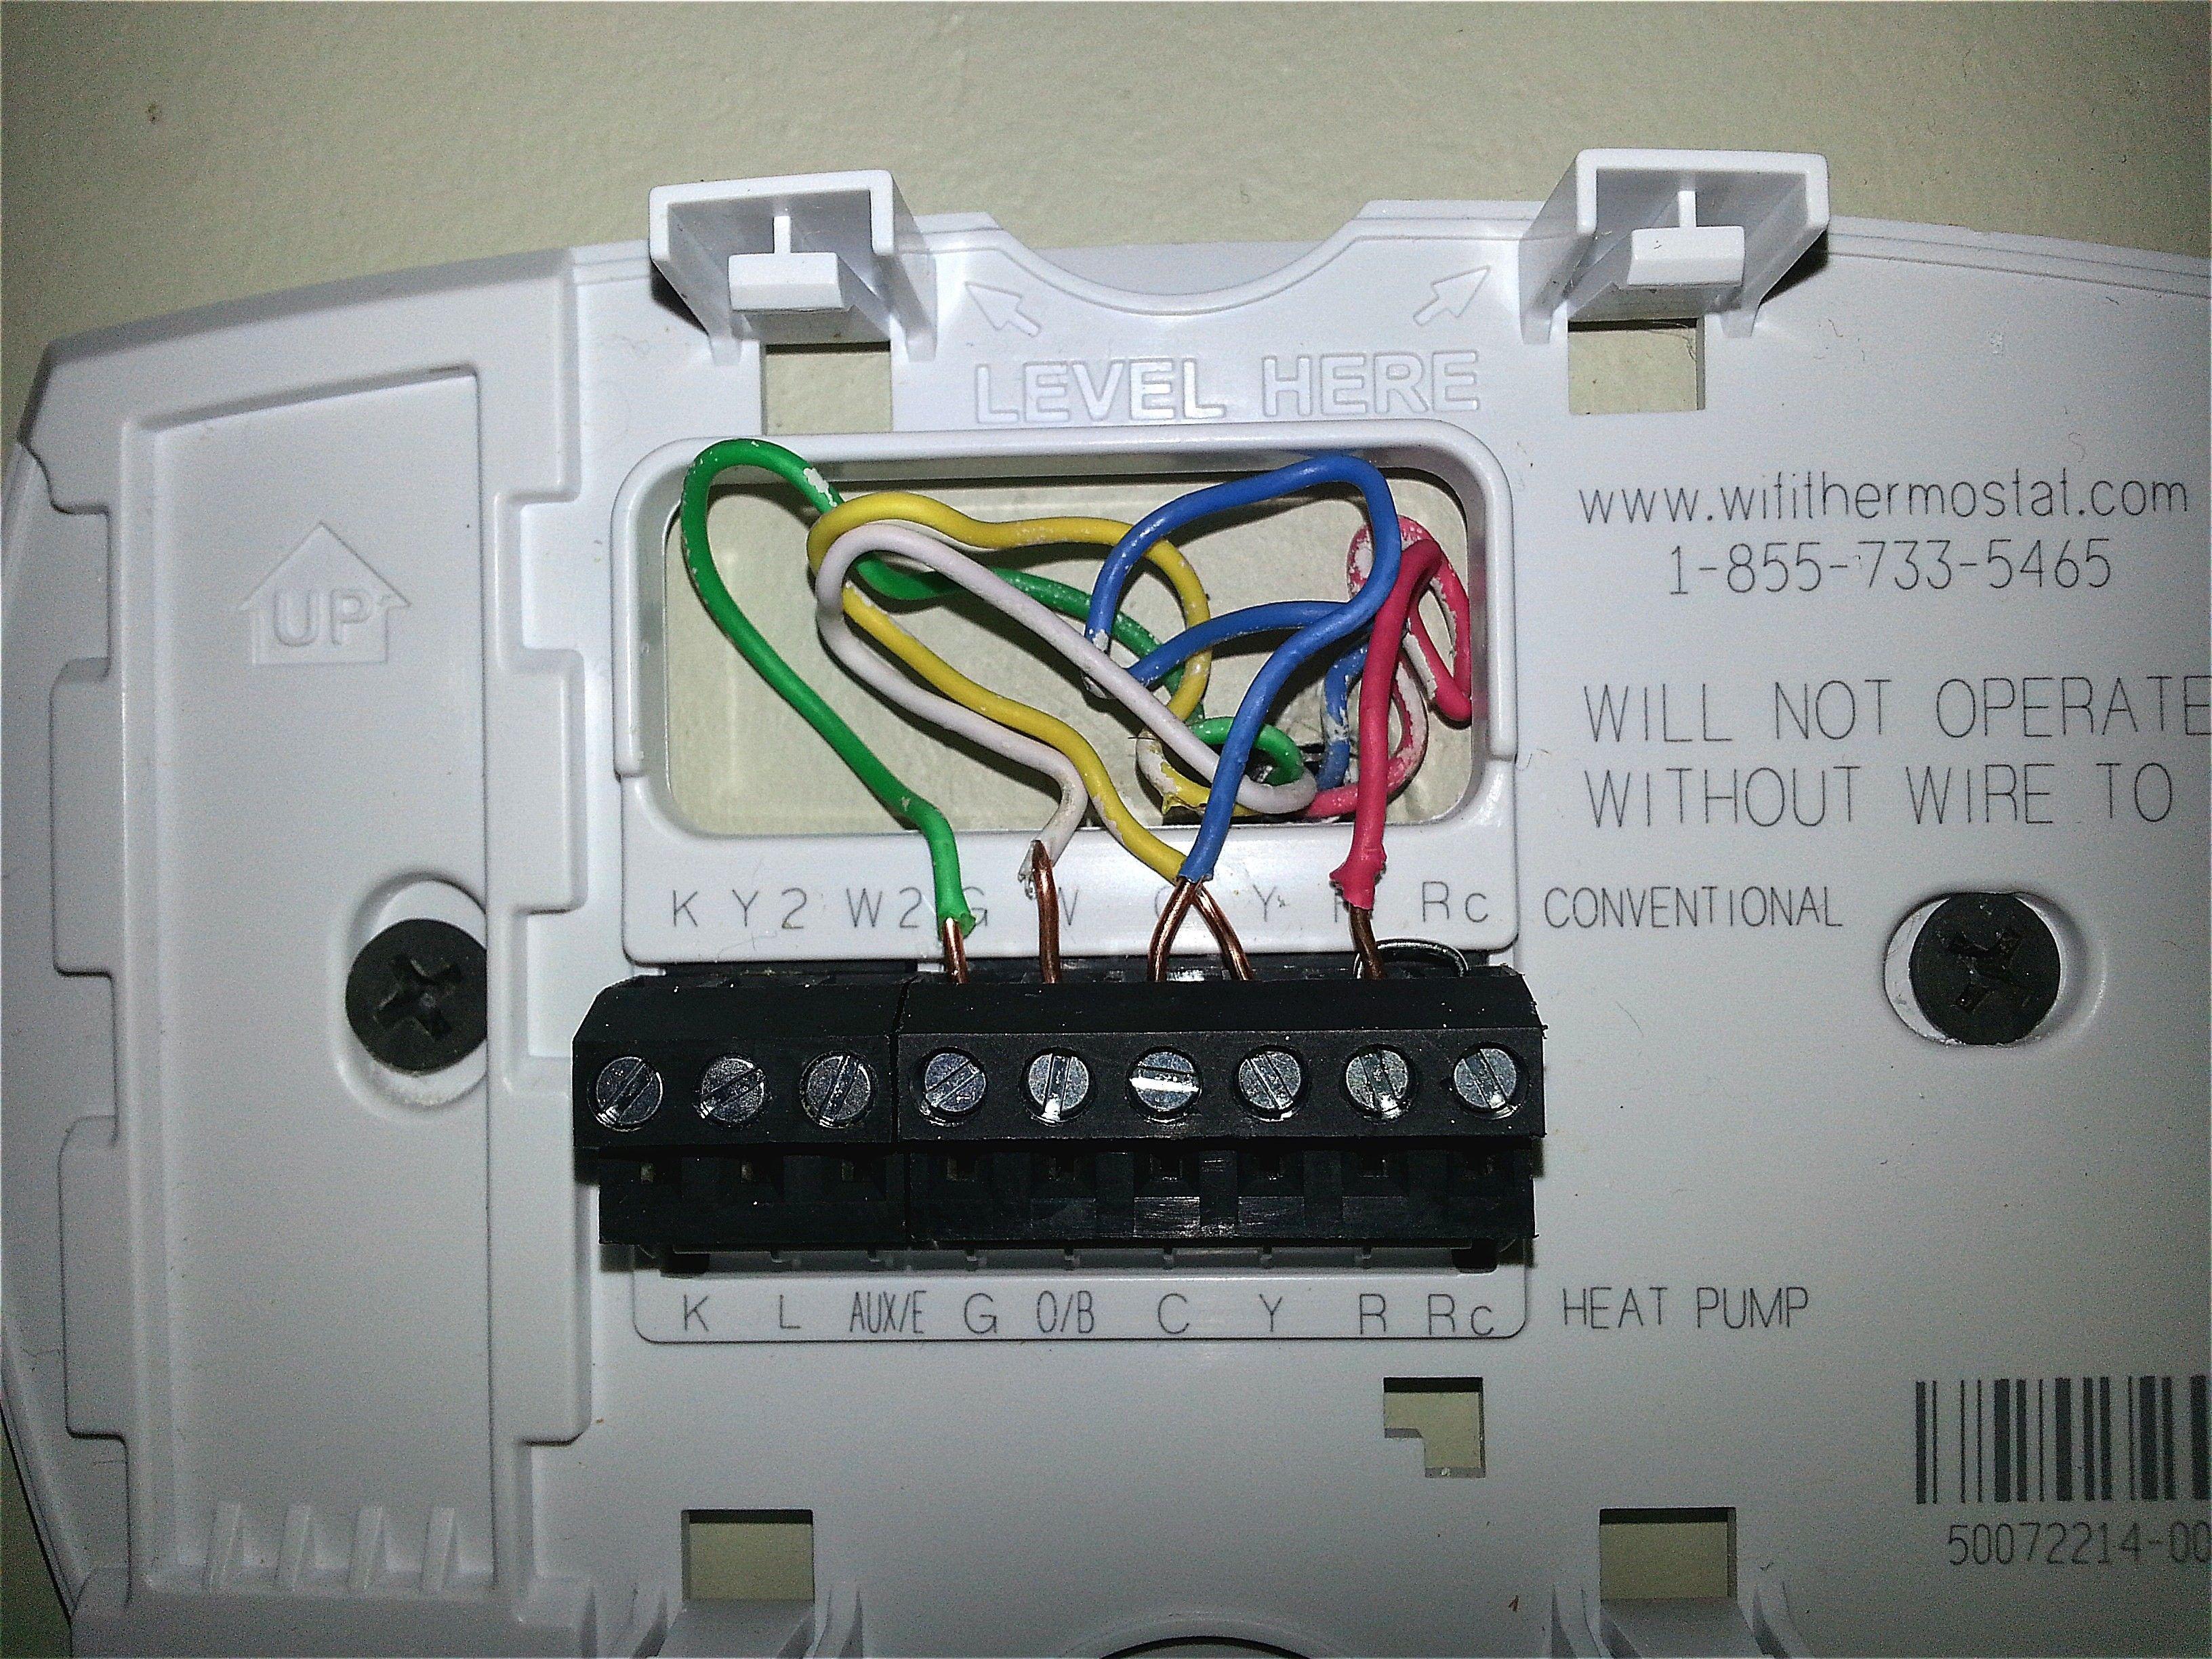 New Honeywell thermostat Rth2310 Wiring Diagram #diagram #diagramsample  #diagramtemplate #wiringdiagram …   Honeywell wifi thermostat, Thermostat  wiring, ThermostatPinterest